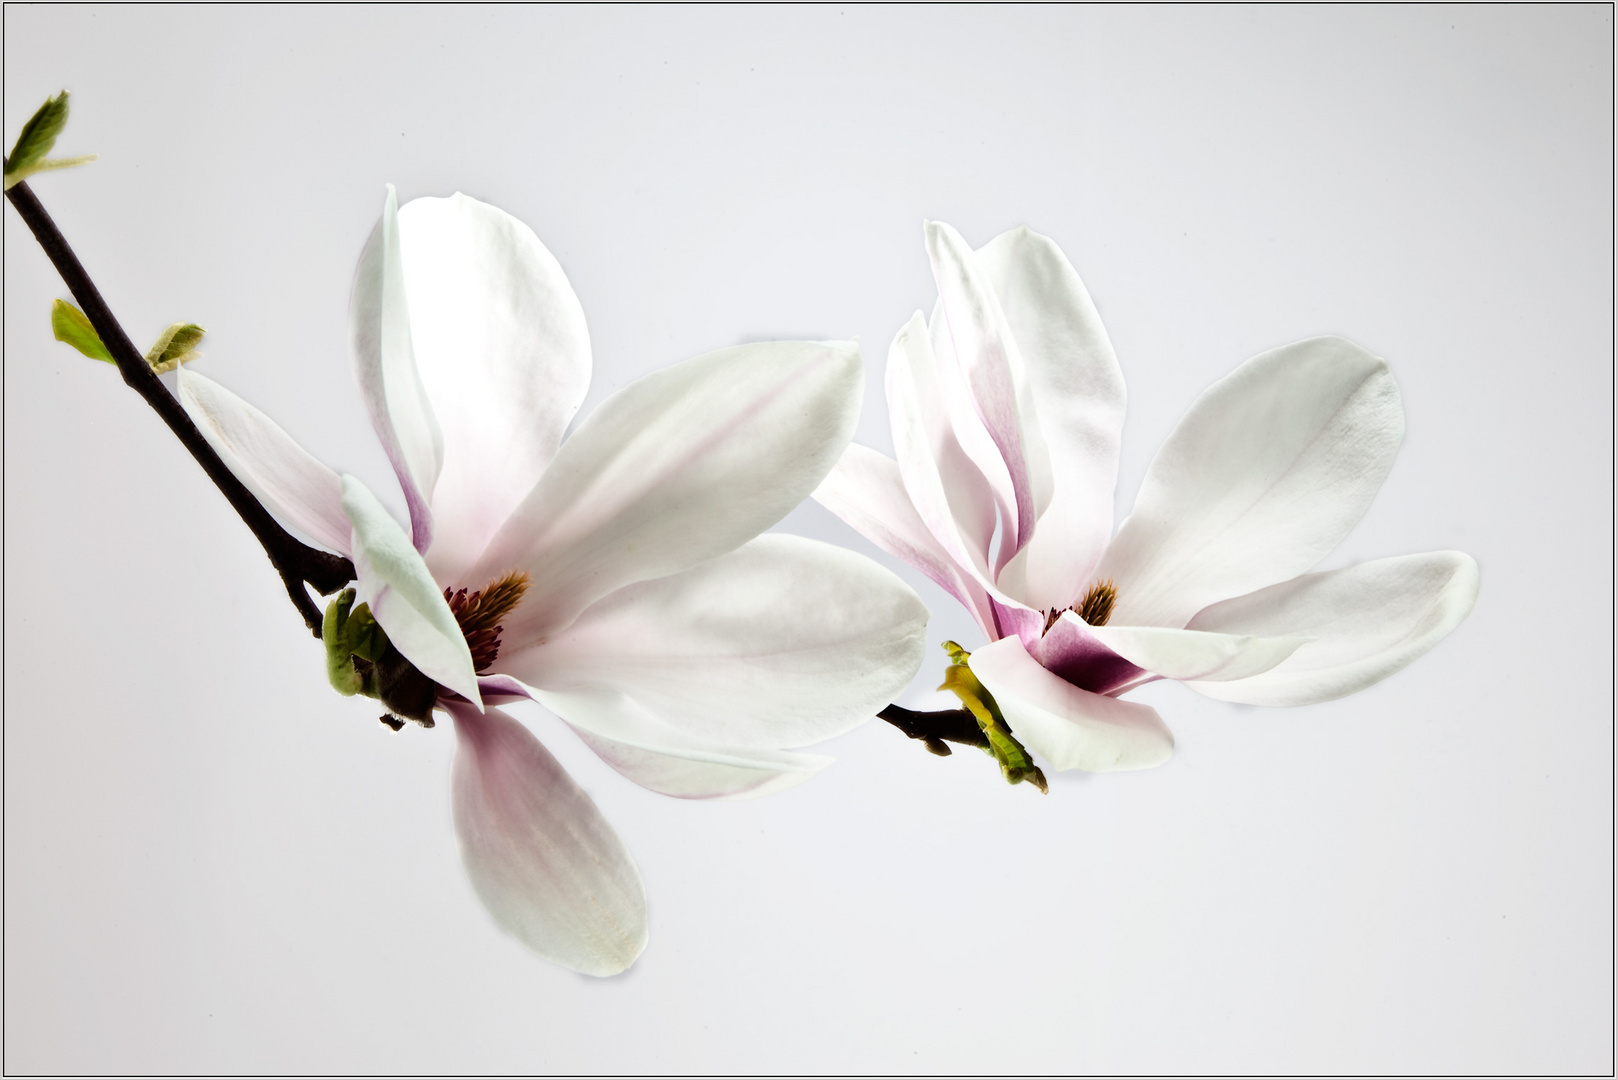 magnolie foto bild pflanzen pilze flechten b ume magnolien bilder auf fotocommunity. Black Bedroom Furniture Sets. Home Design Ideas